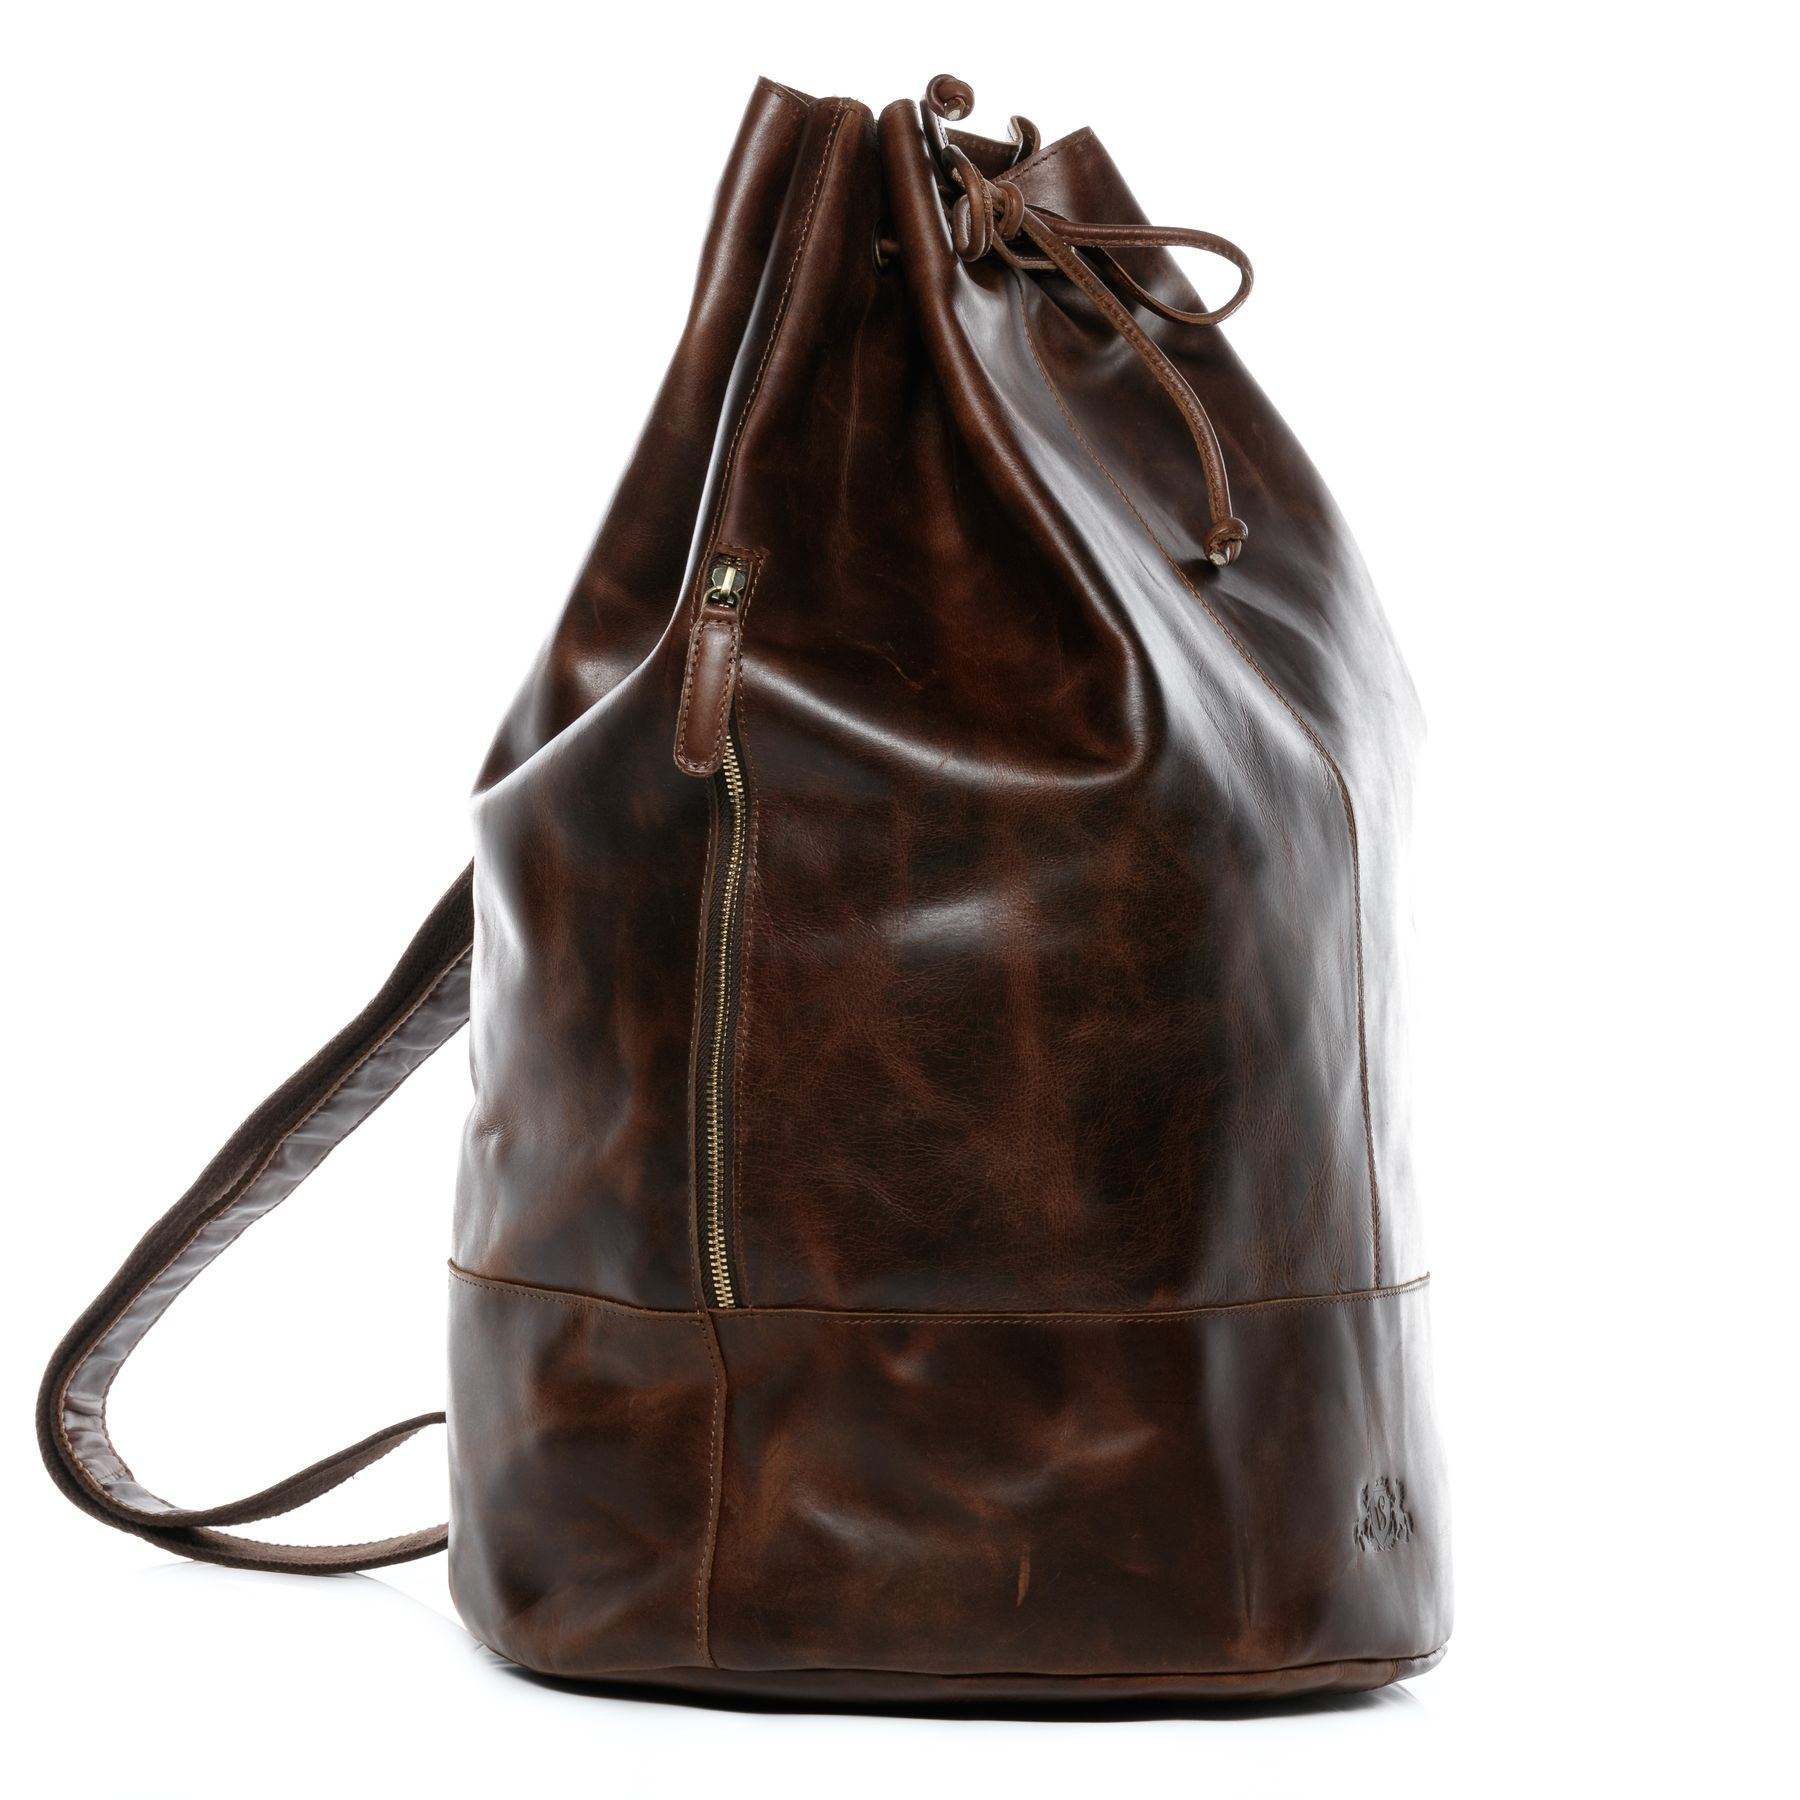 c95be44161 SID & VAIN sac marin cuir marron sac de voyage sac paquetage marin Sacs de  voyage Sacs de sport